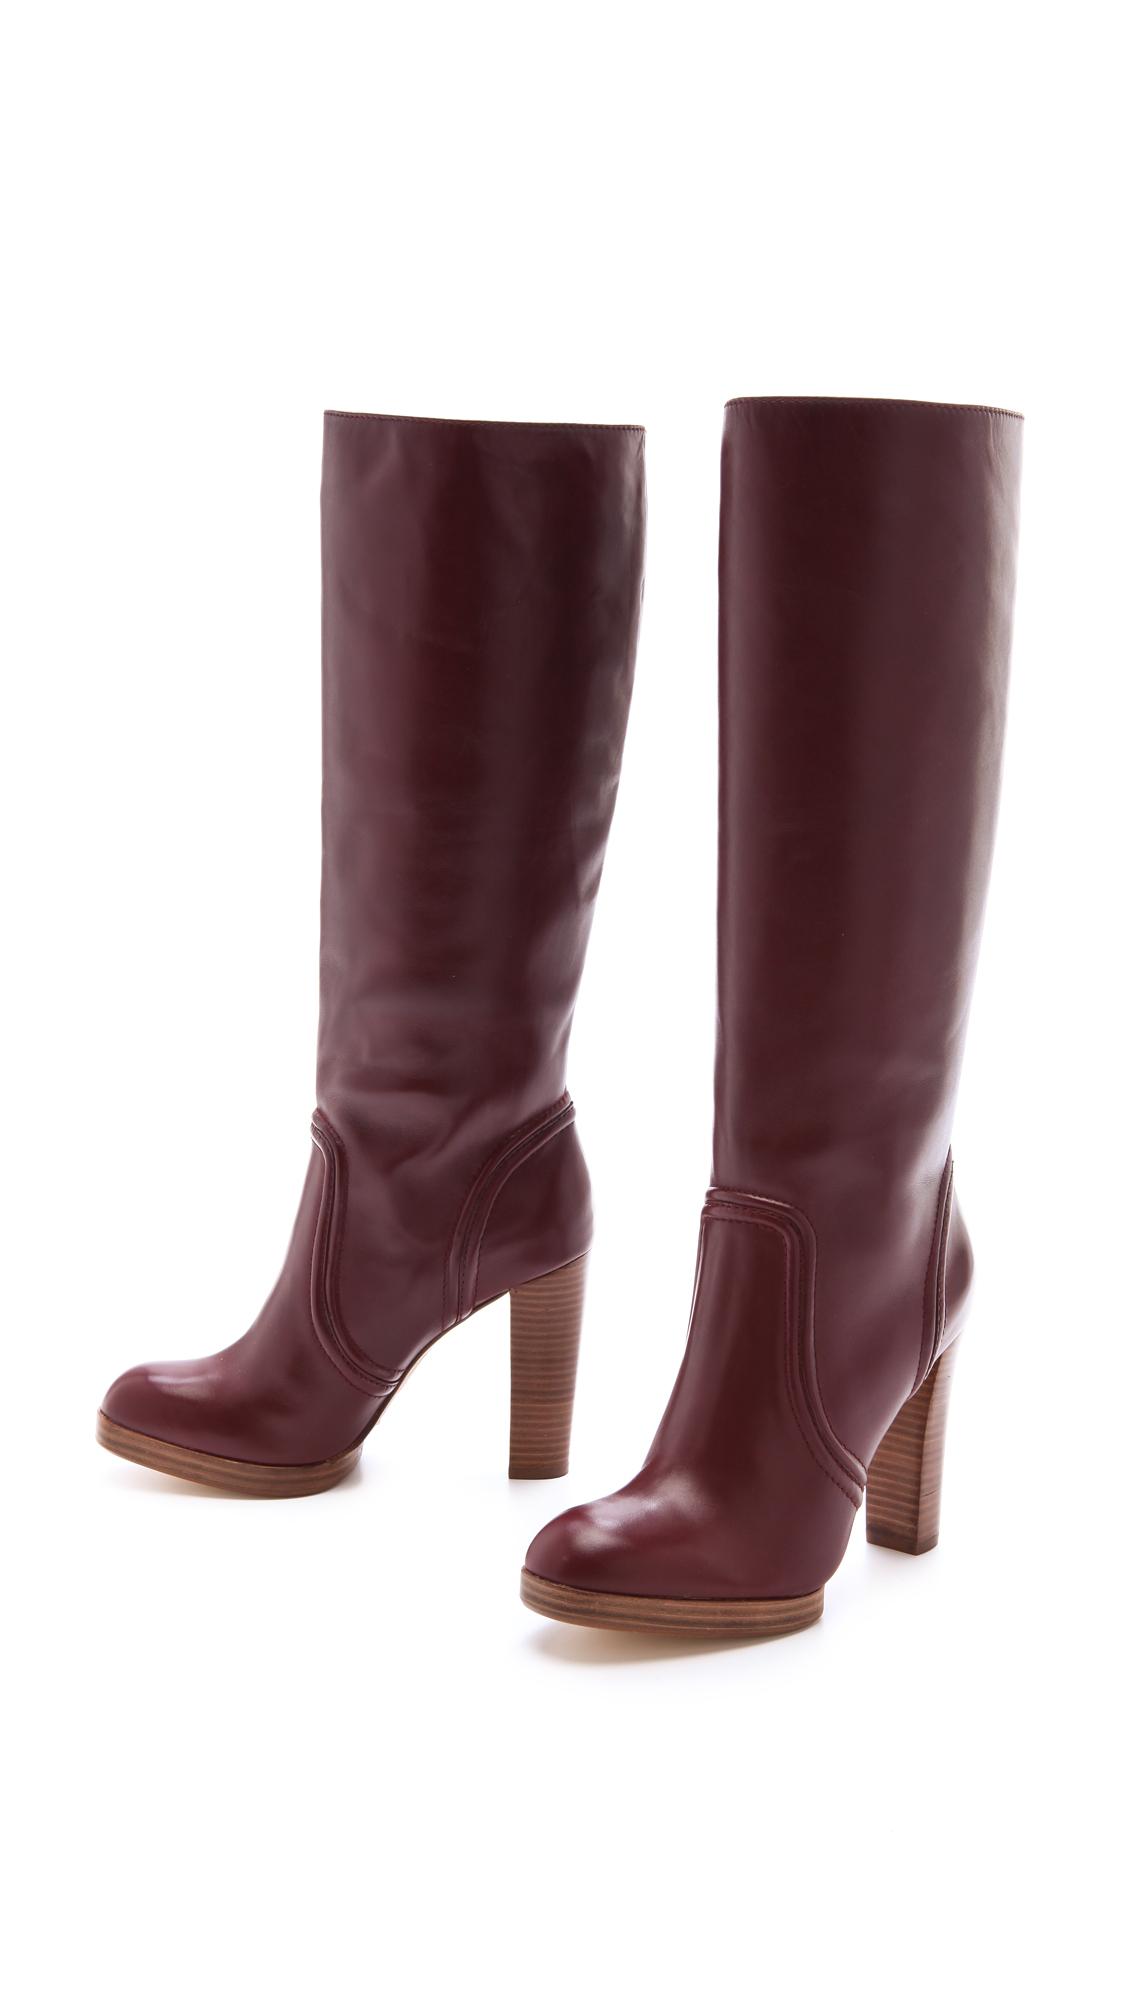 michael kors leather boots memes